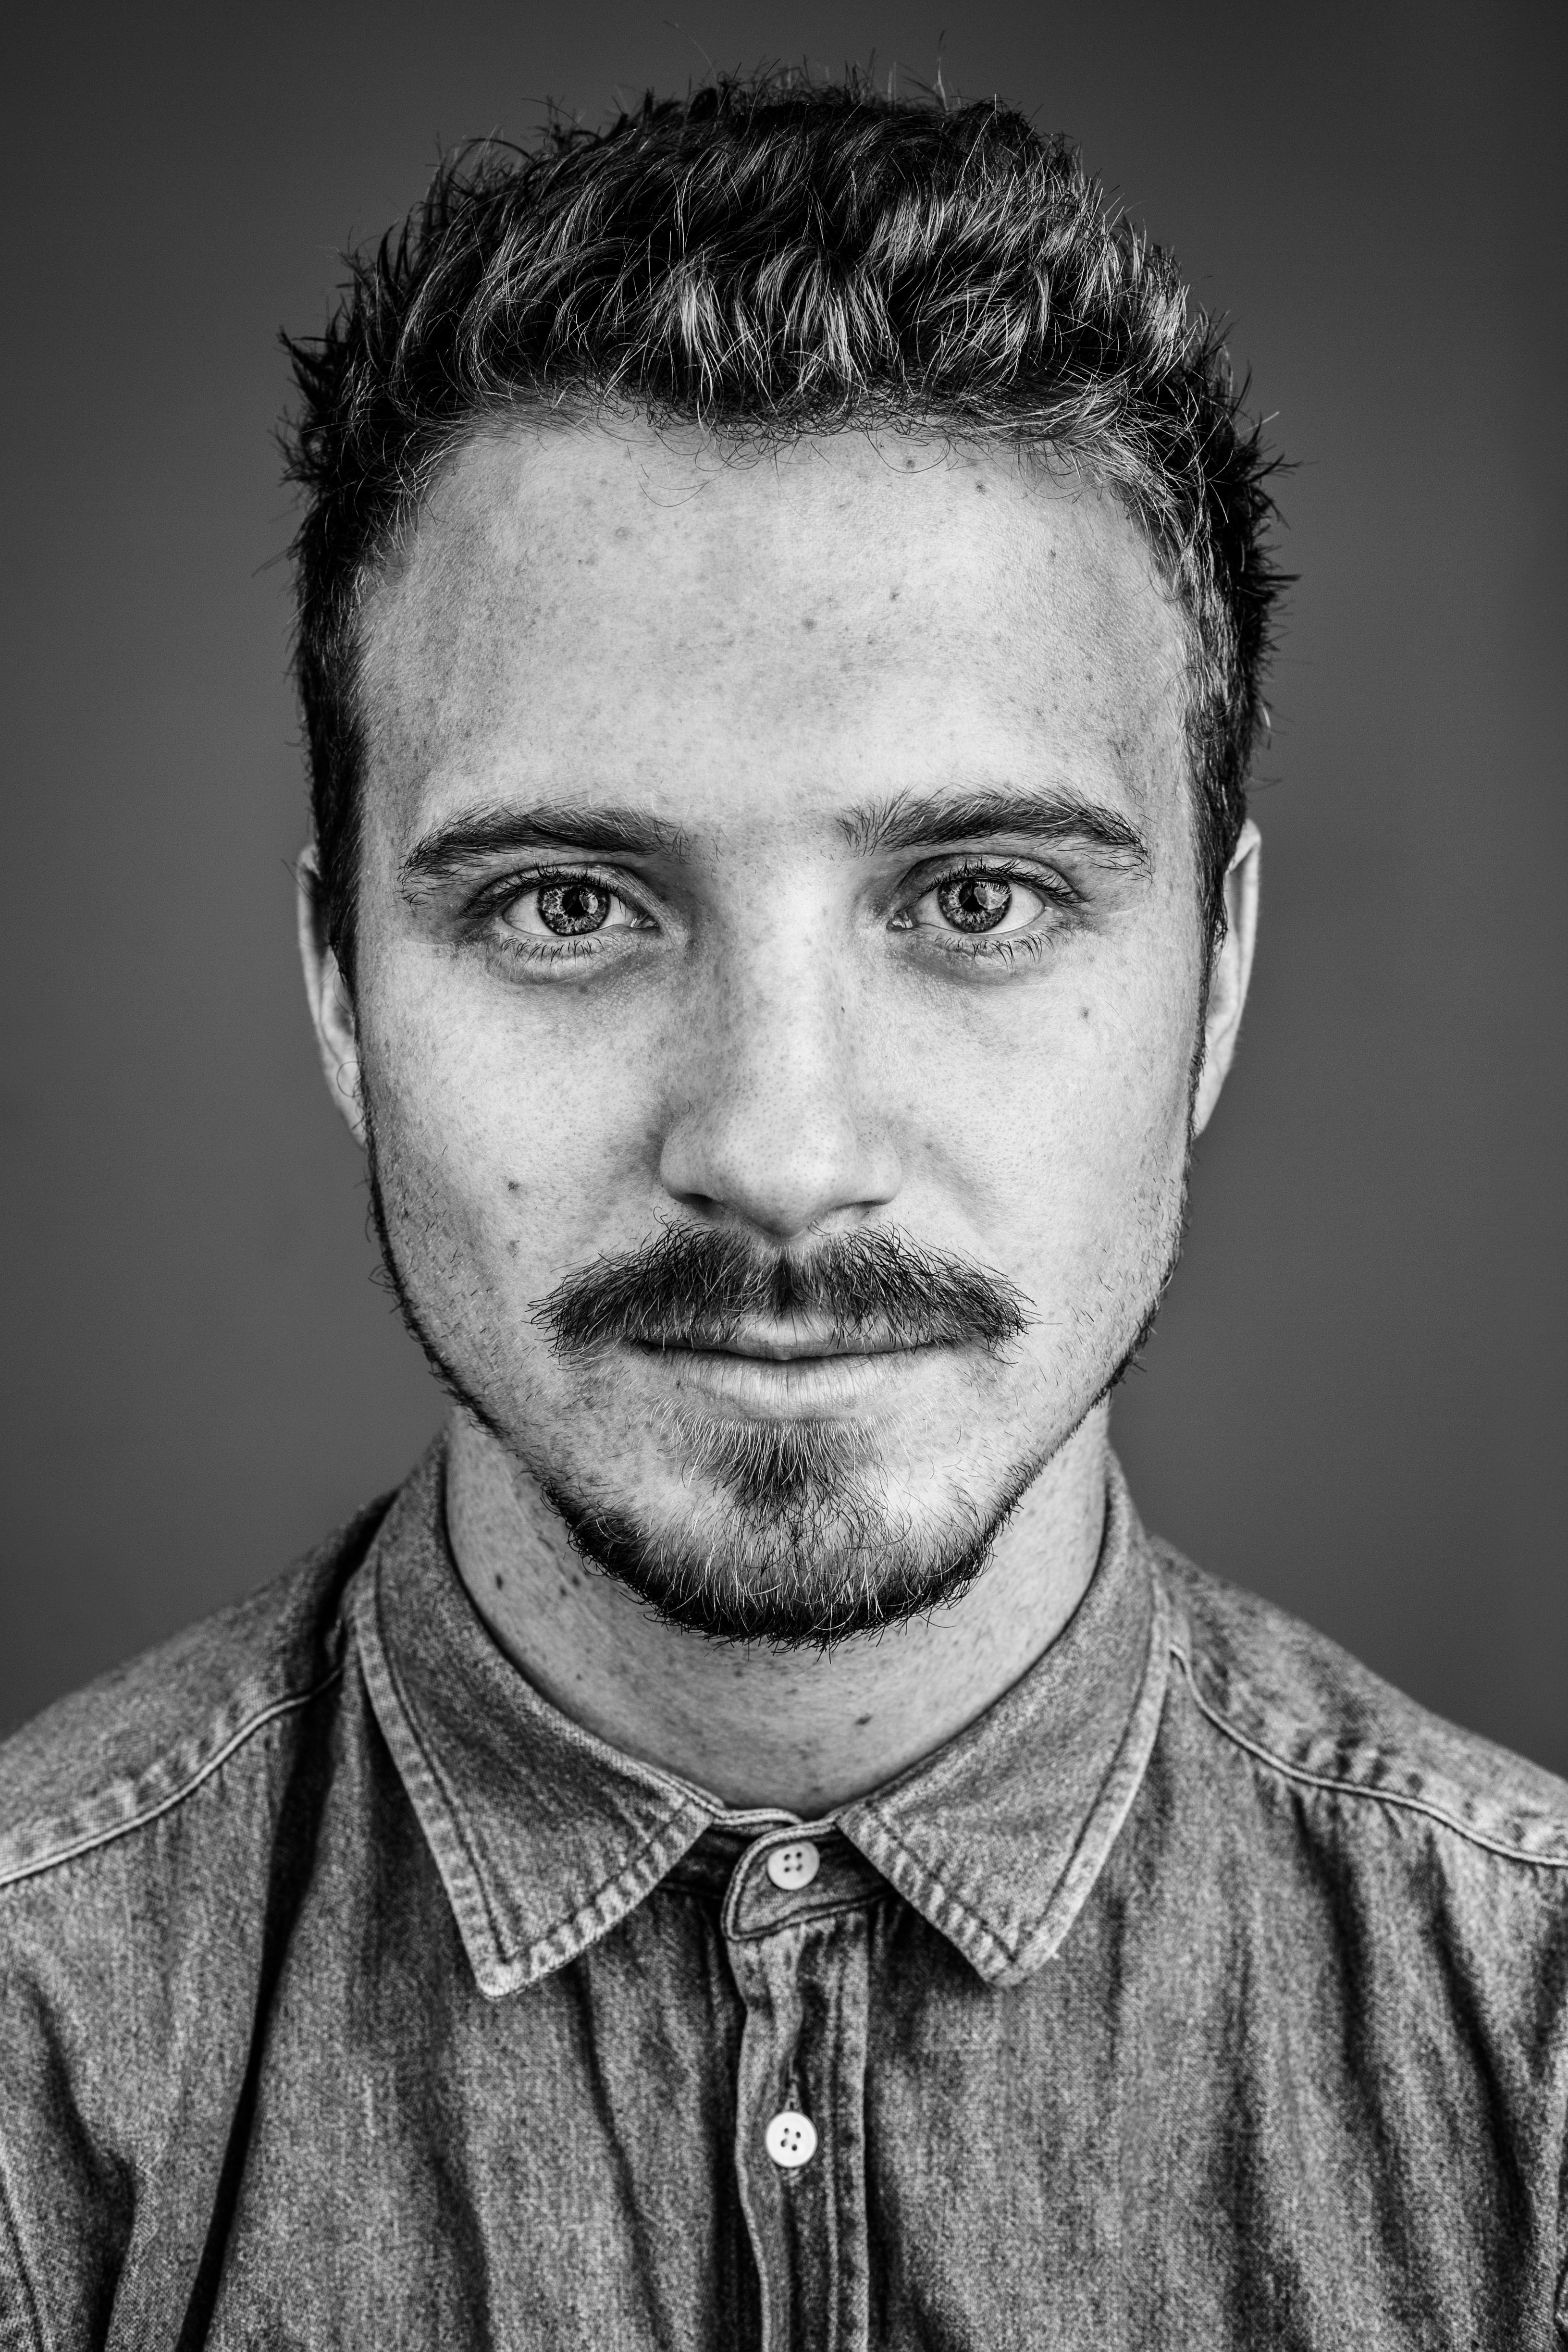 Justin Bell - Headshot